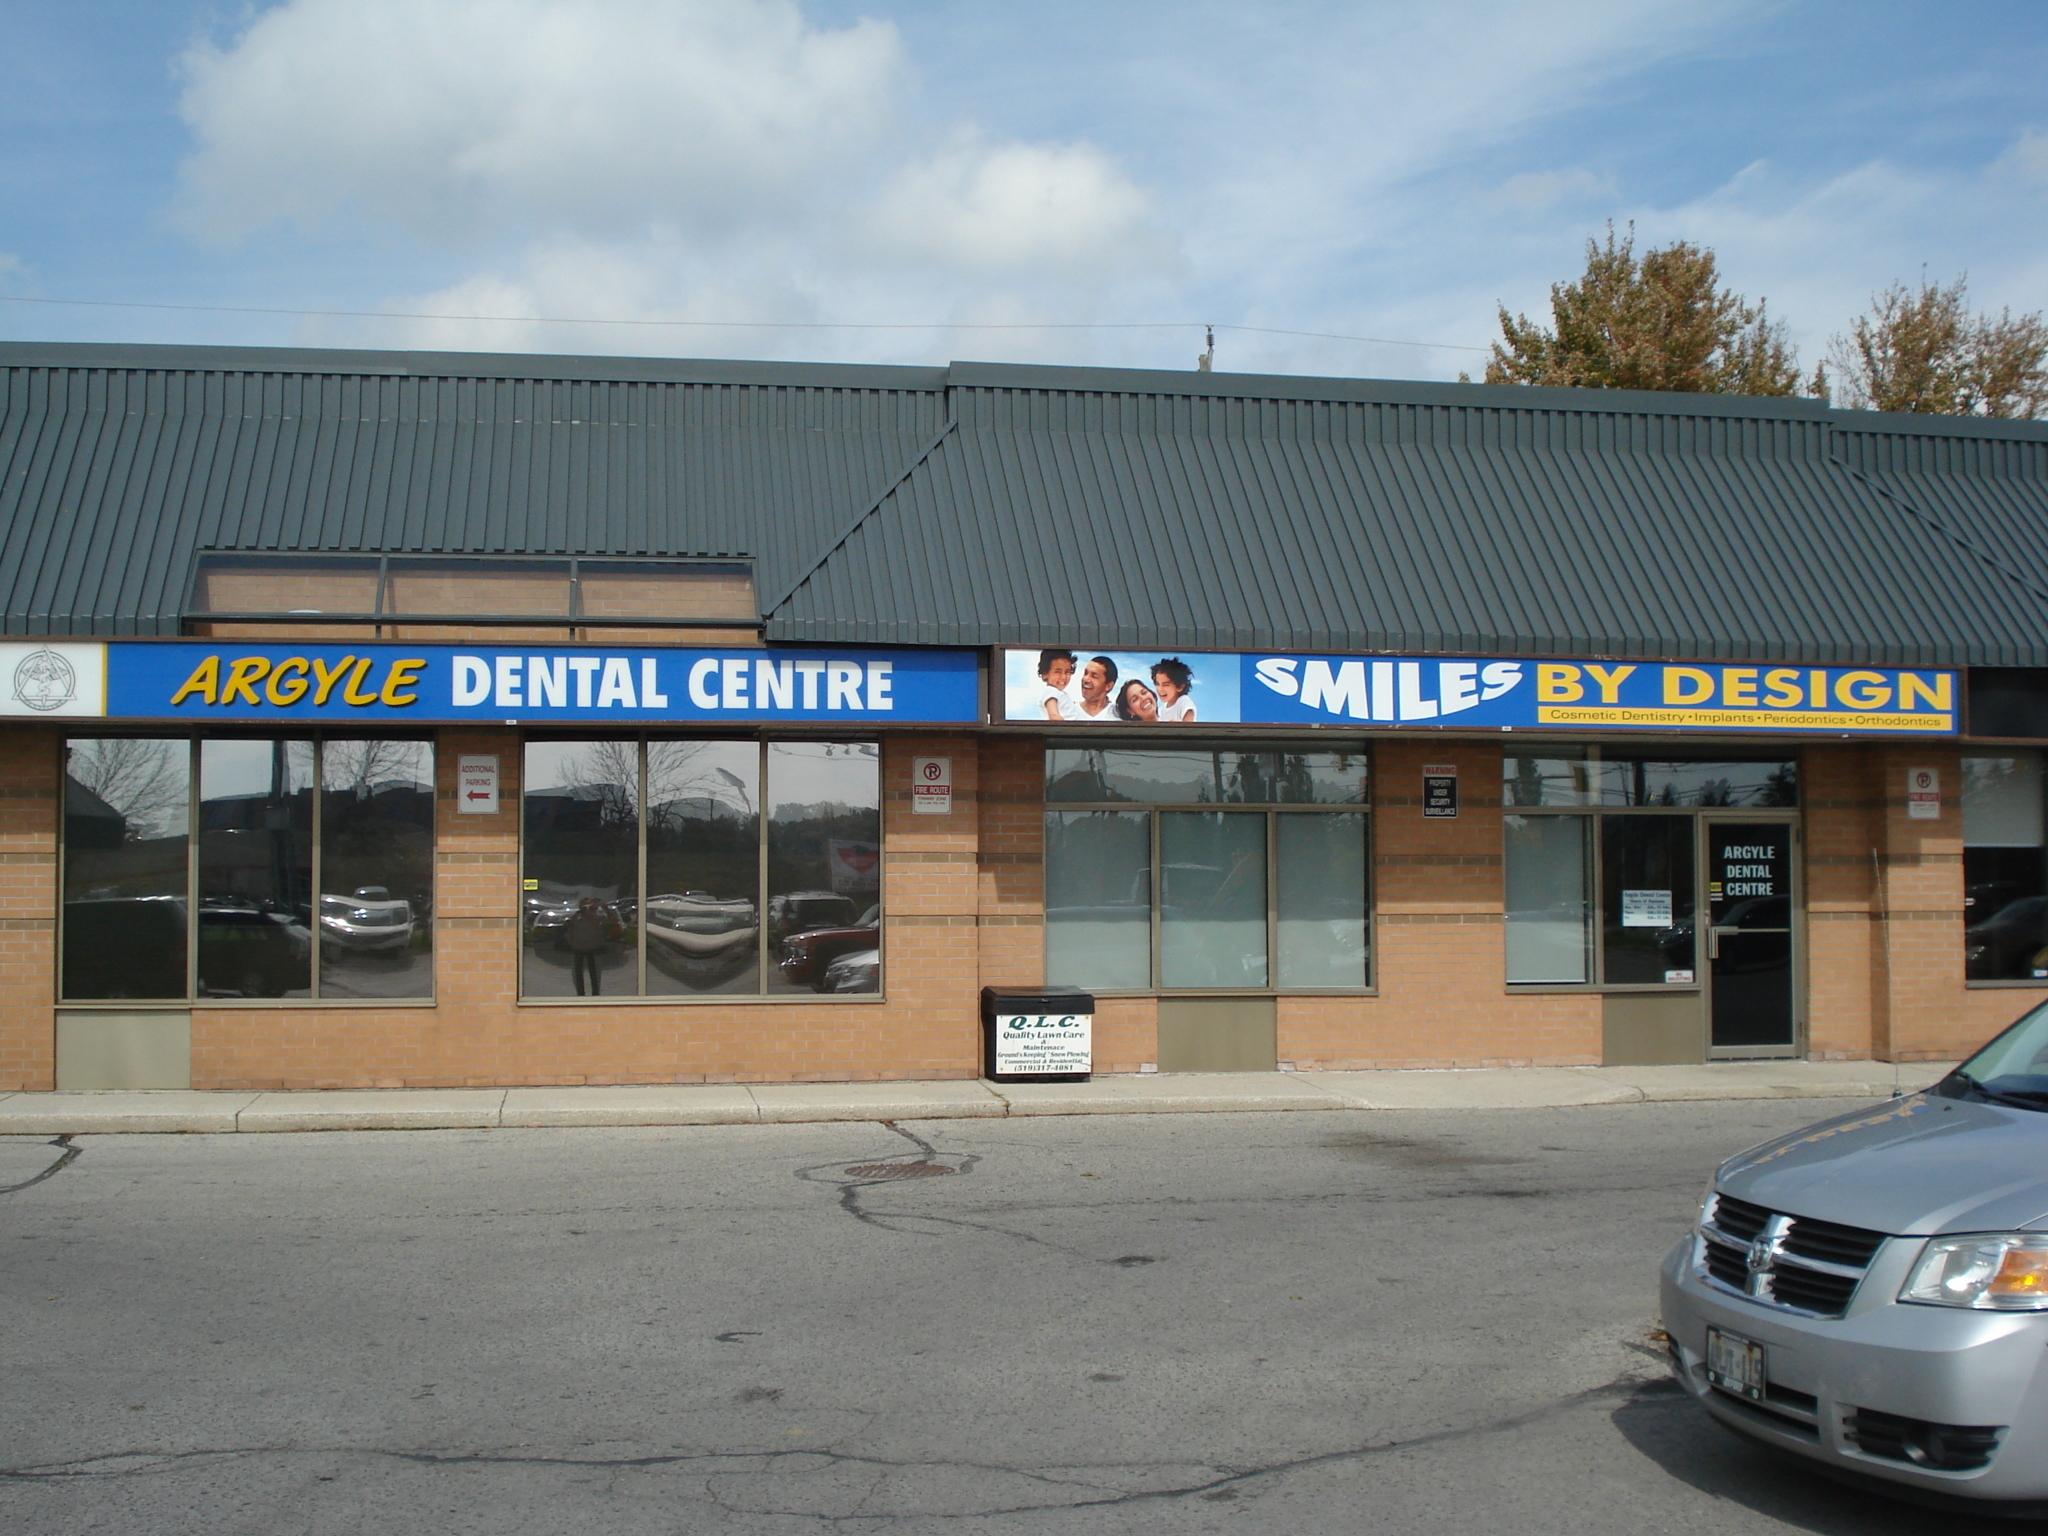 Argyle Dental Centre London (519)455-1441